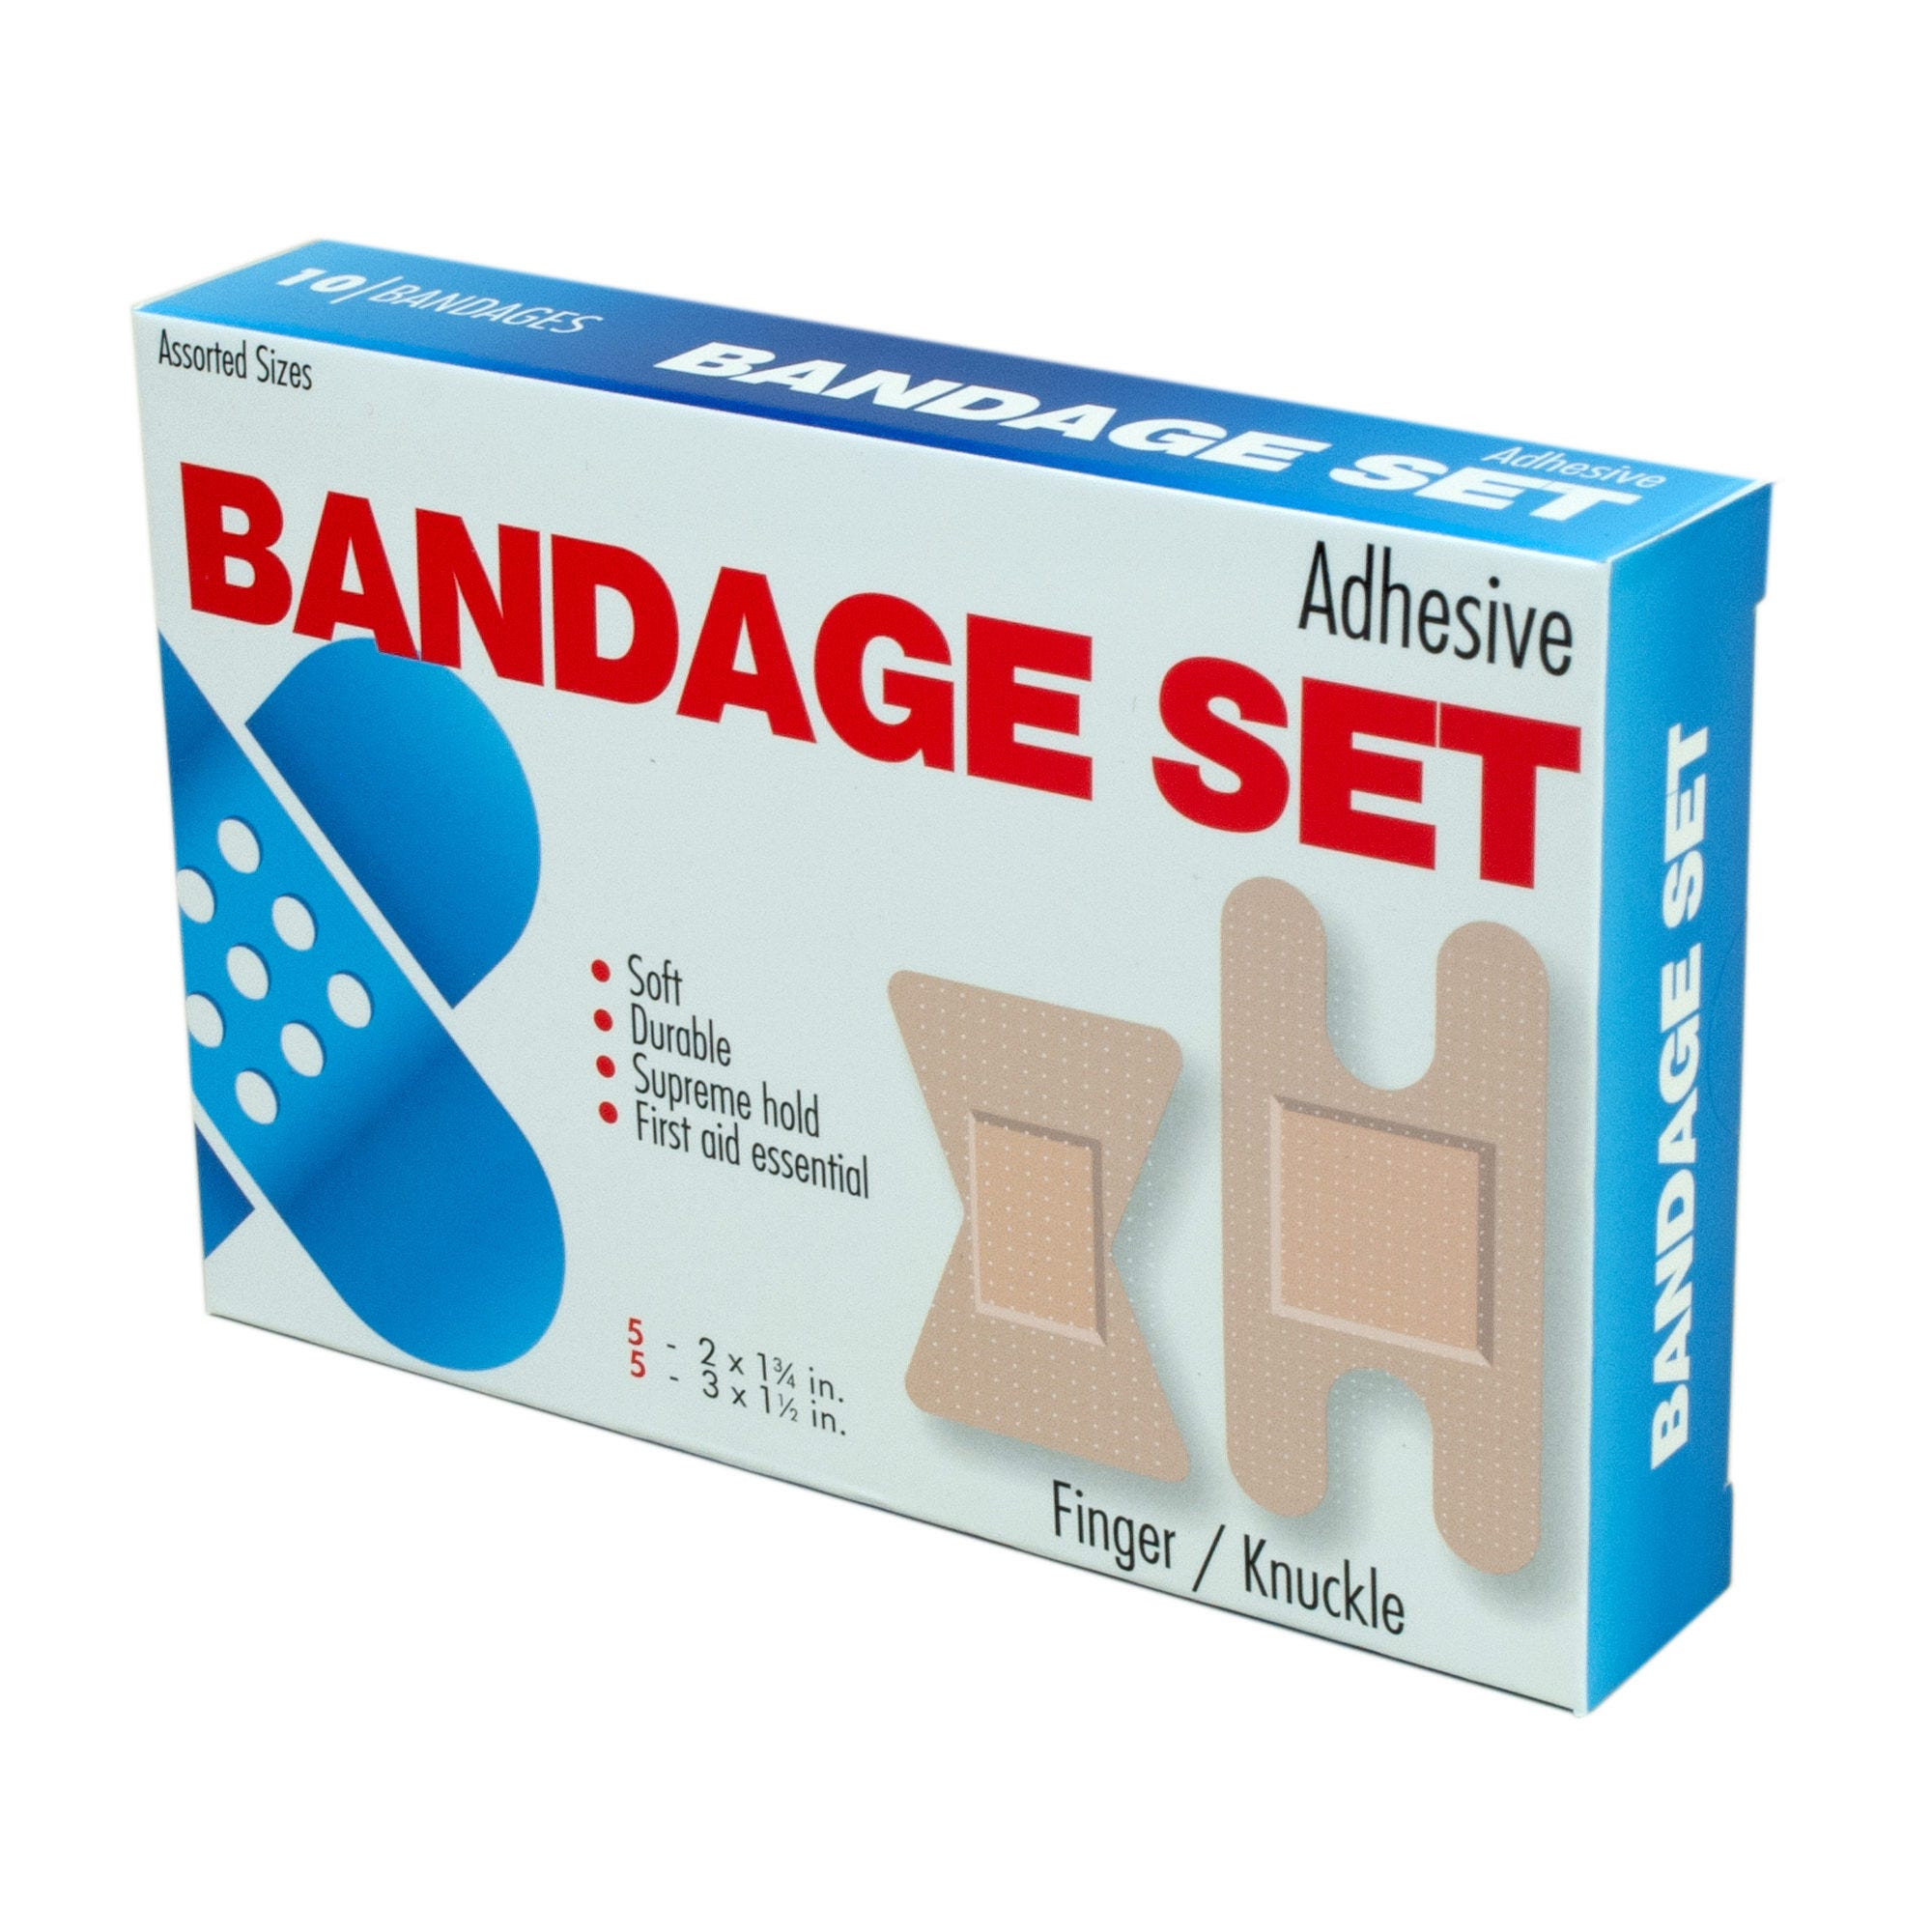 Bandages 6 Asst in Floor Display